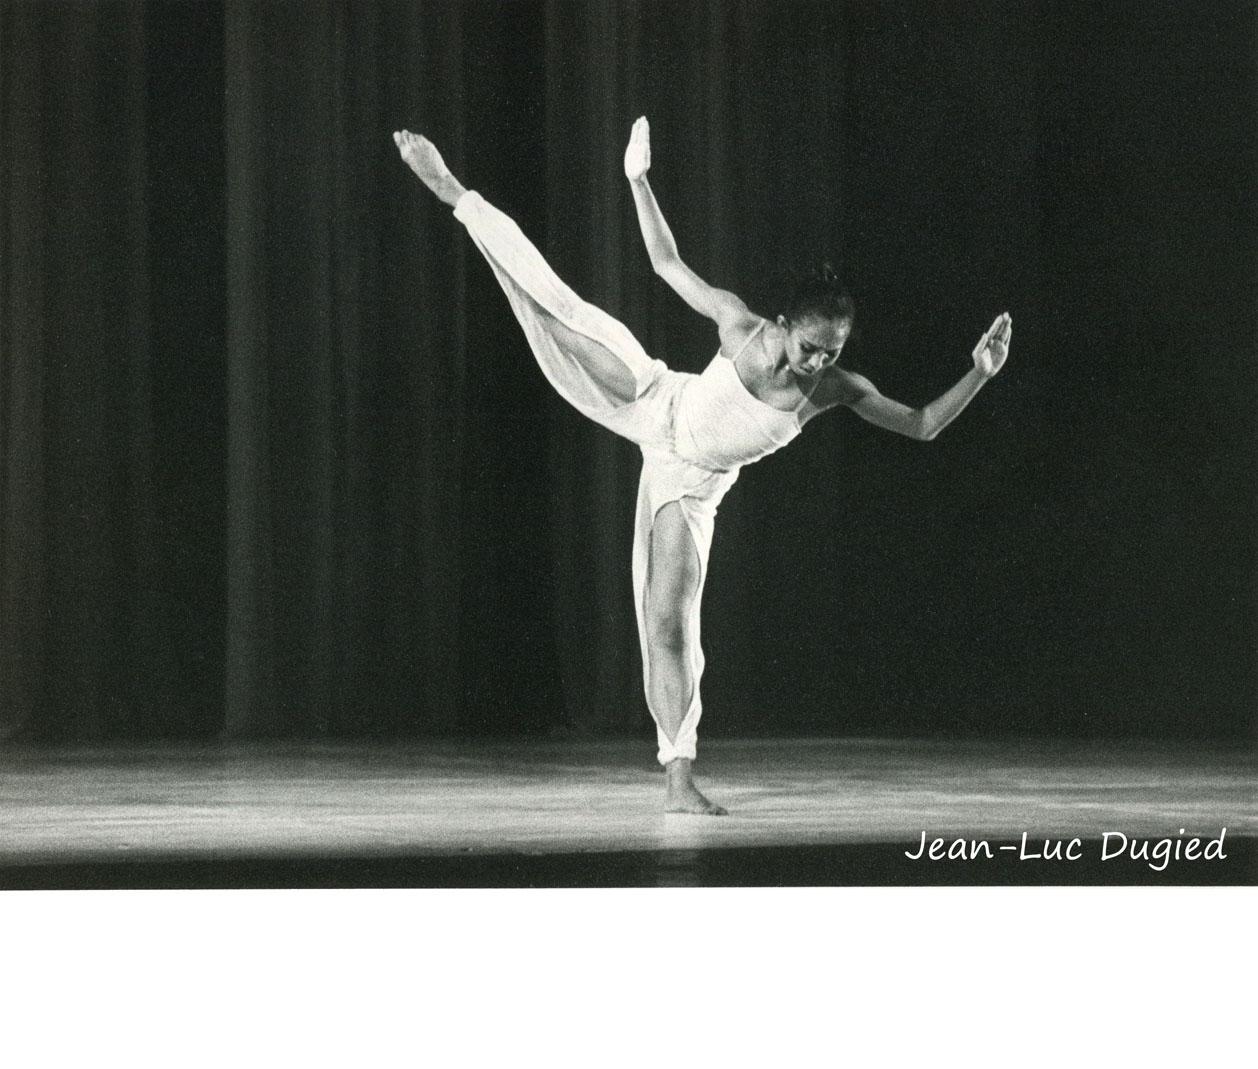 30 Trisler Joyce - koan - Elisabeth Roxas - 1983